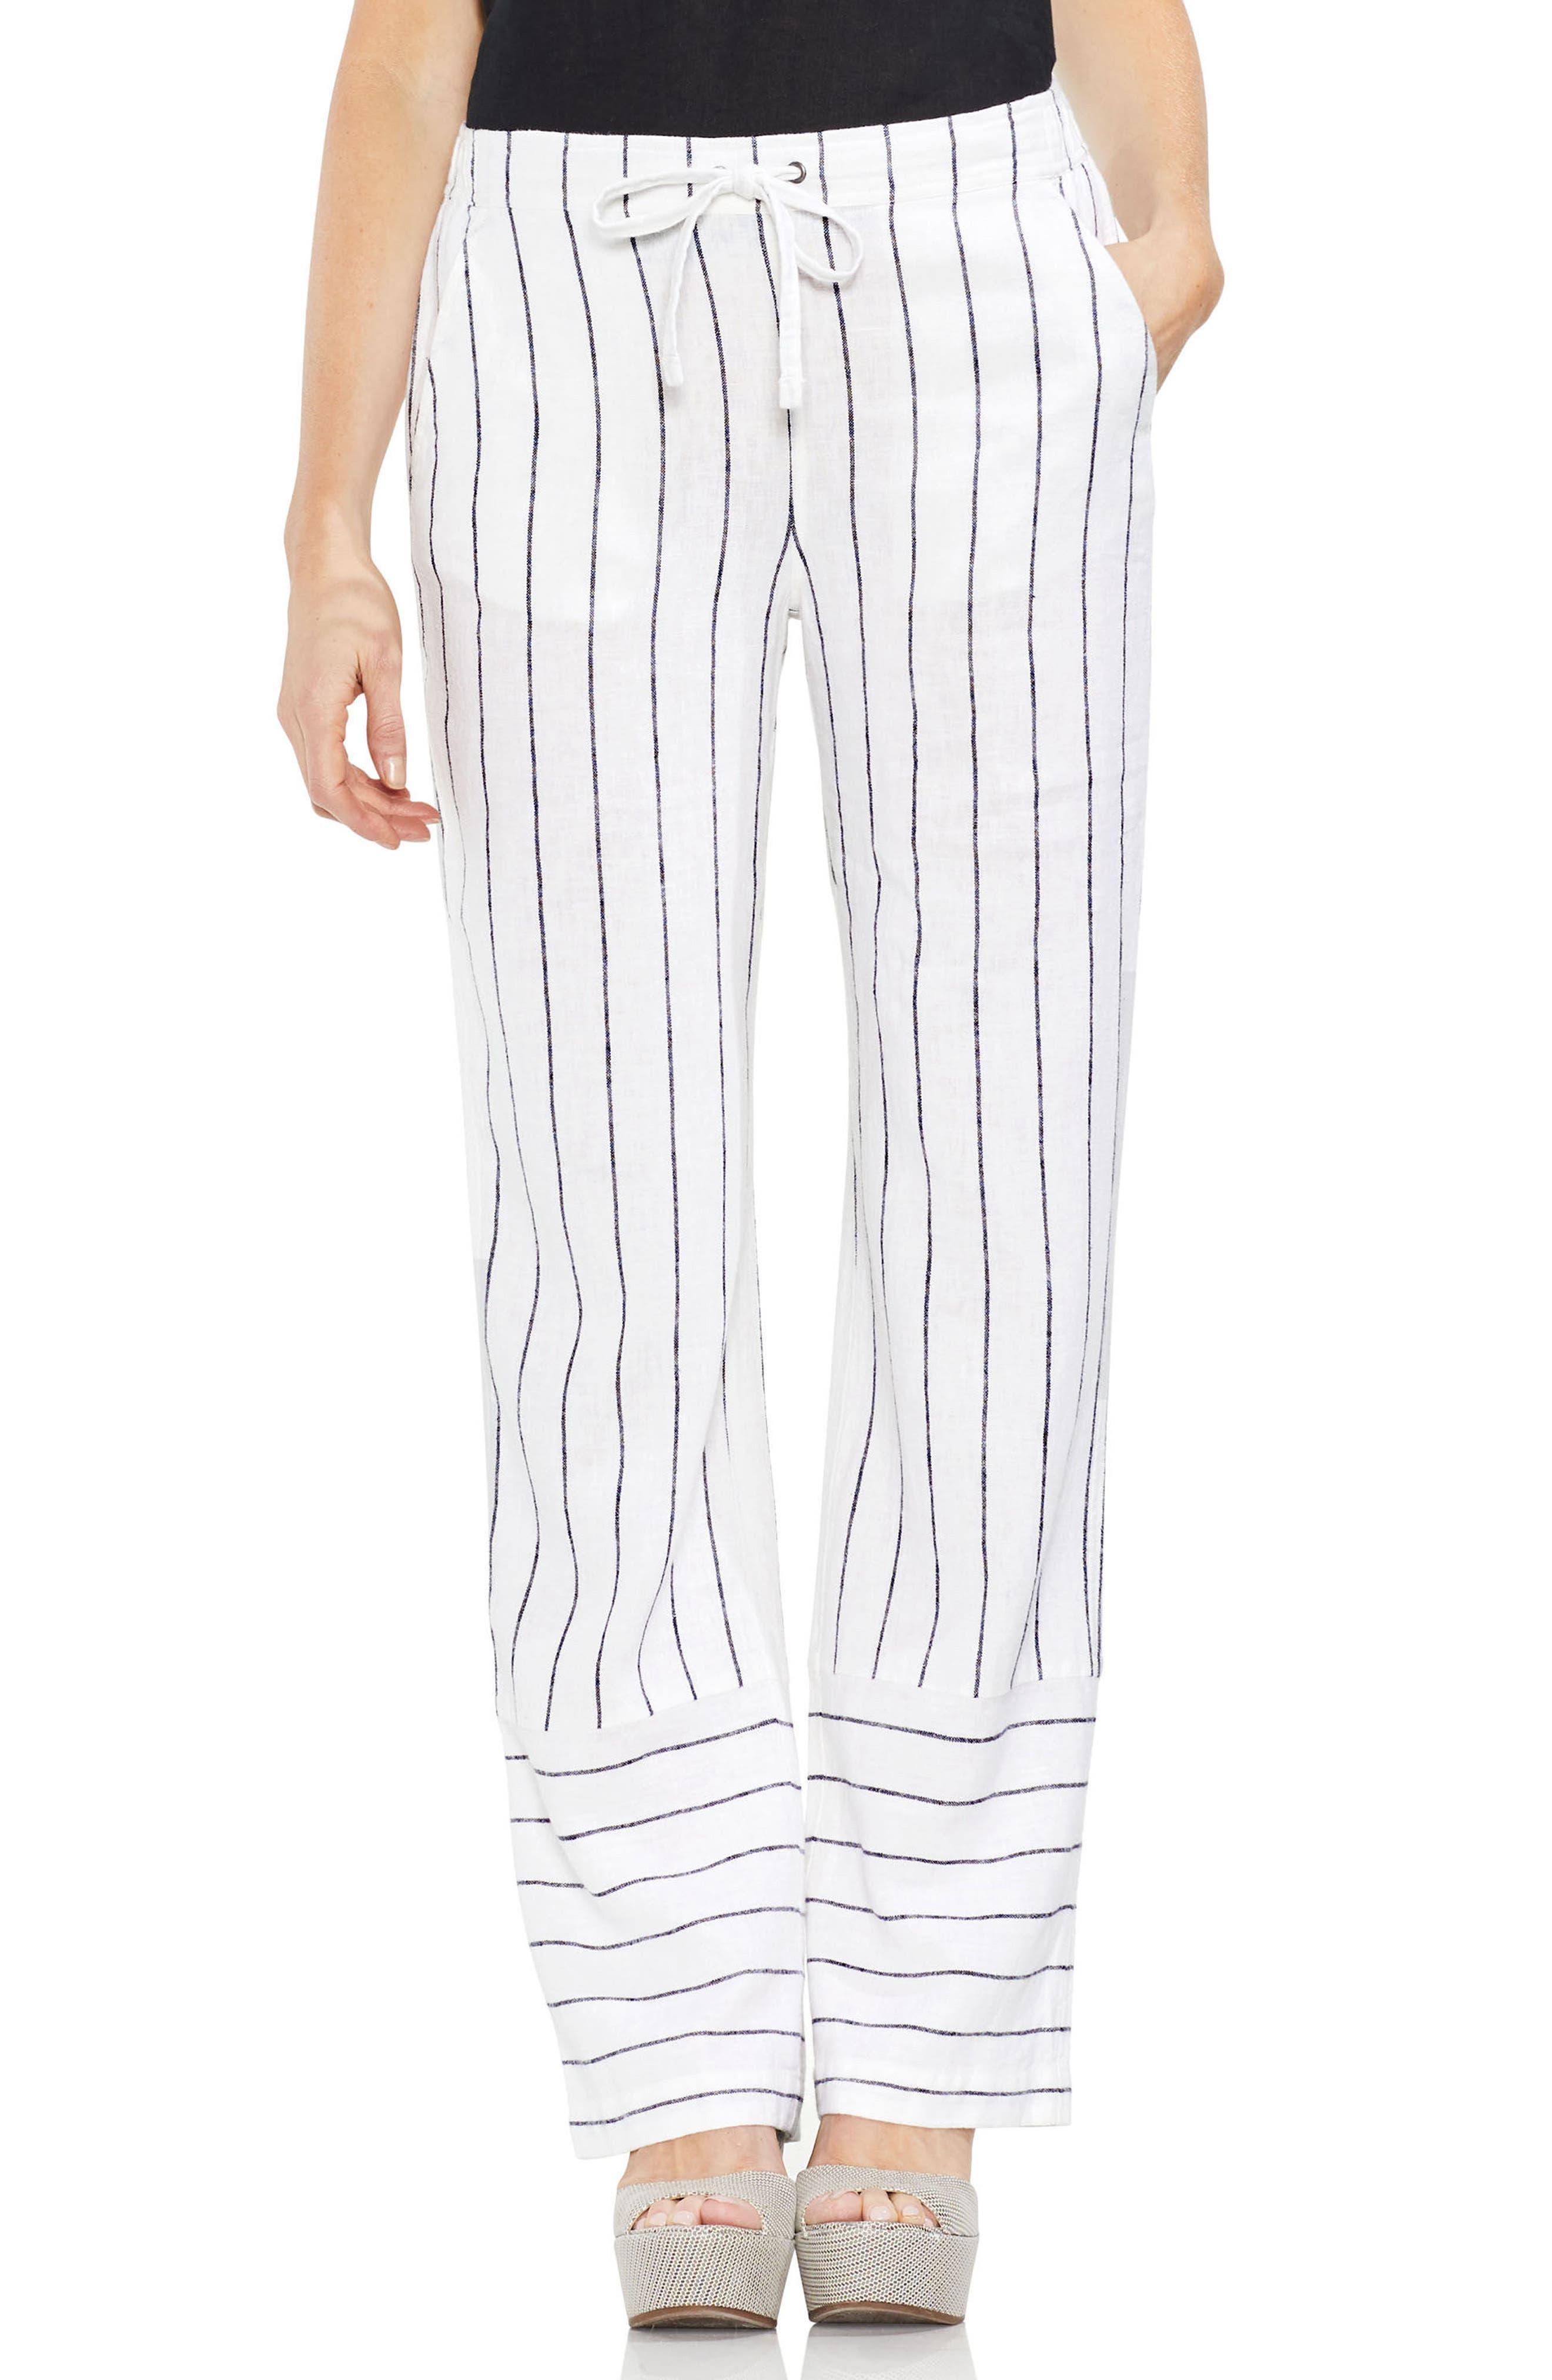 Pinstripe Linen Blend Drawstring Pants,                             Main thumbnail 1, color,                             Ultra White